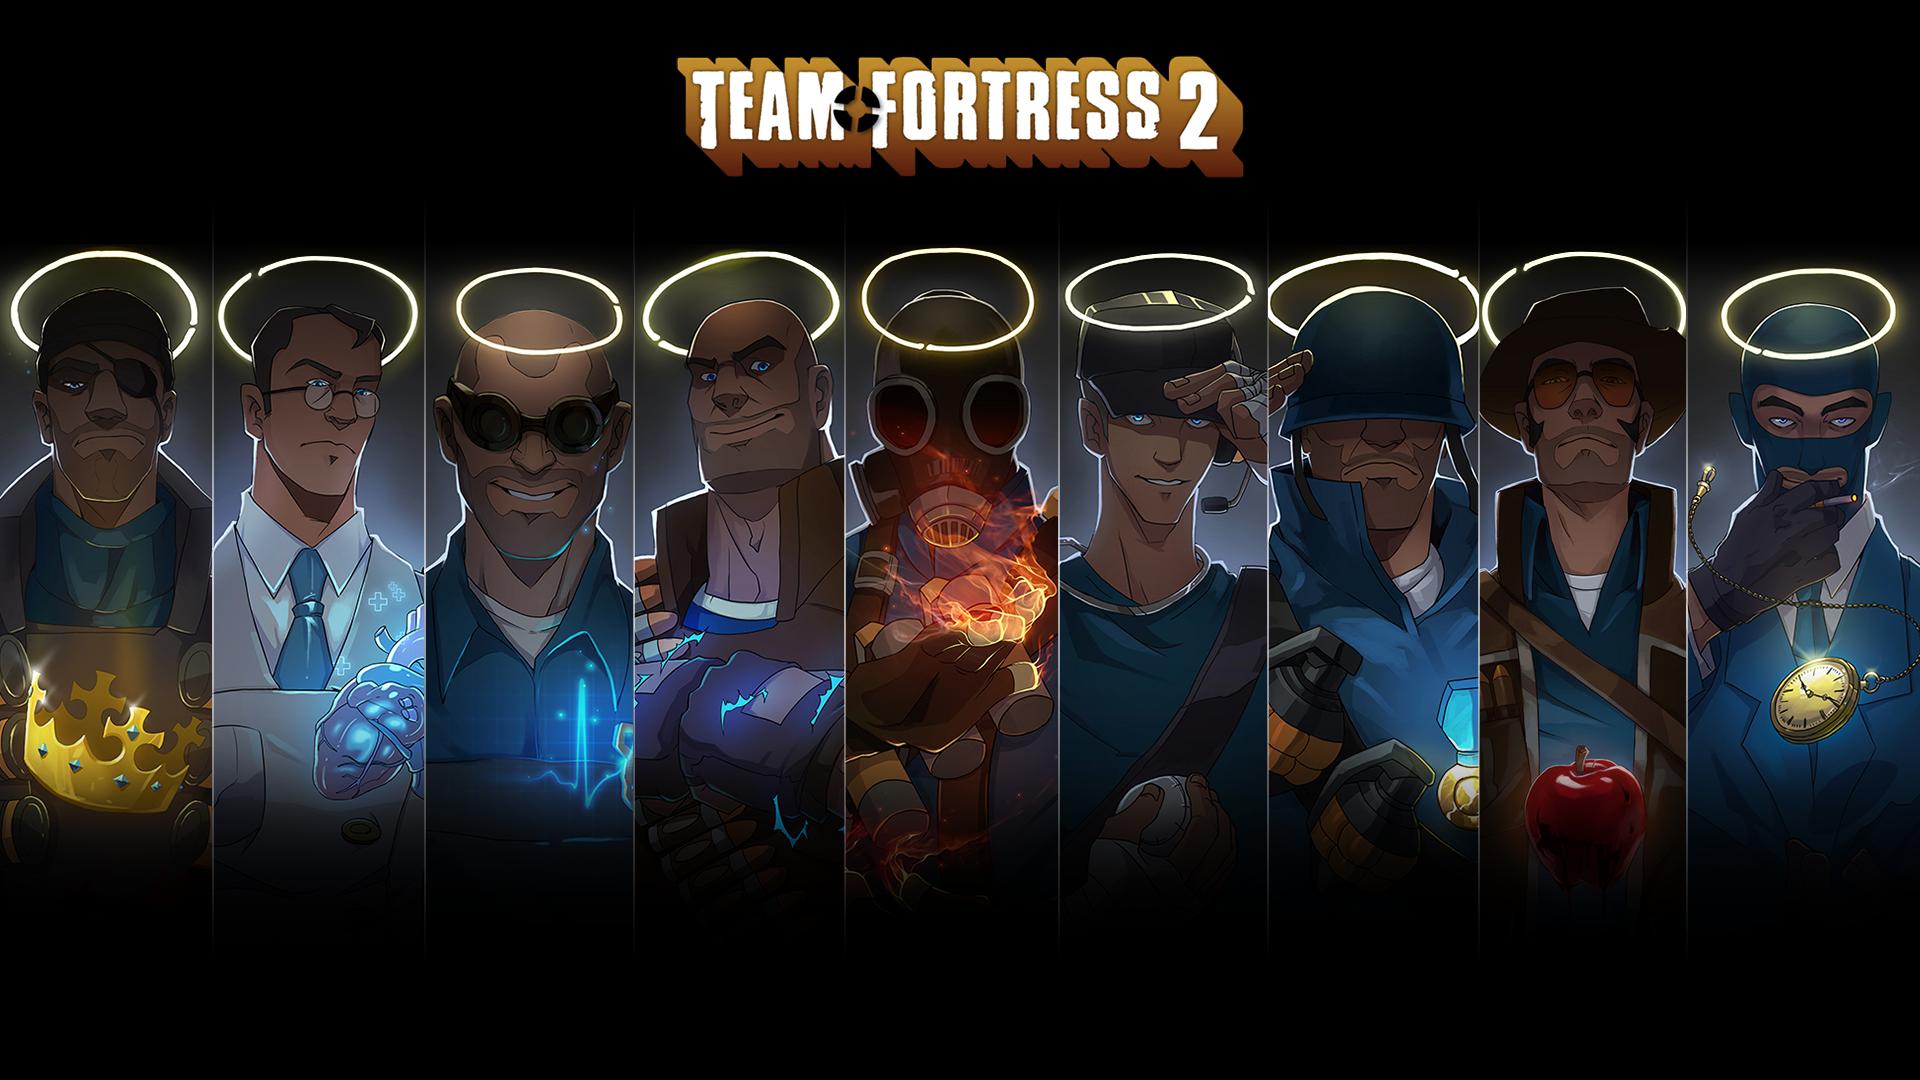 Teamfortress 2 Portrait Wallpaper By Marechal Ecto On Deviantart